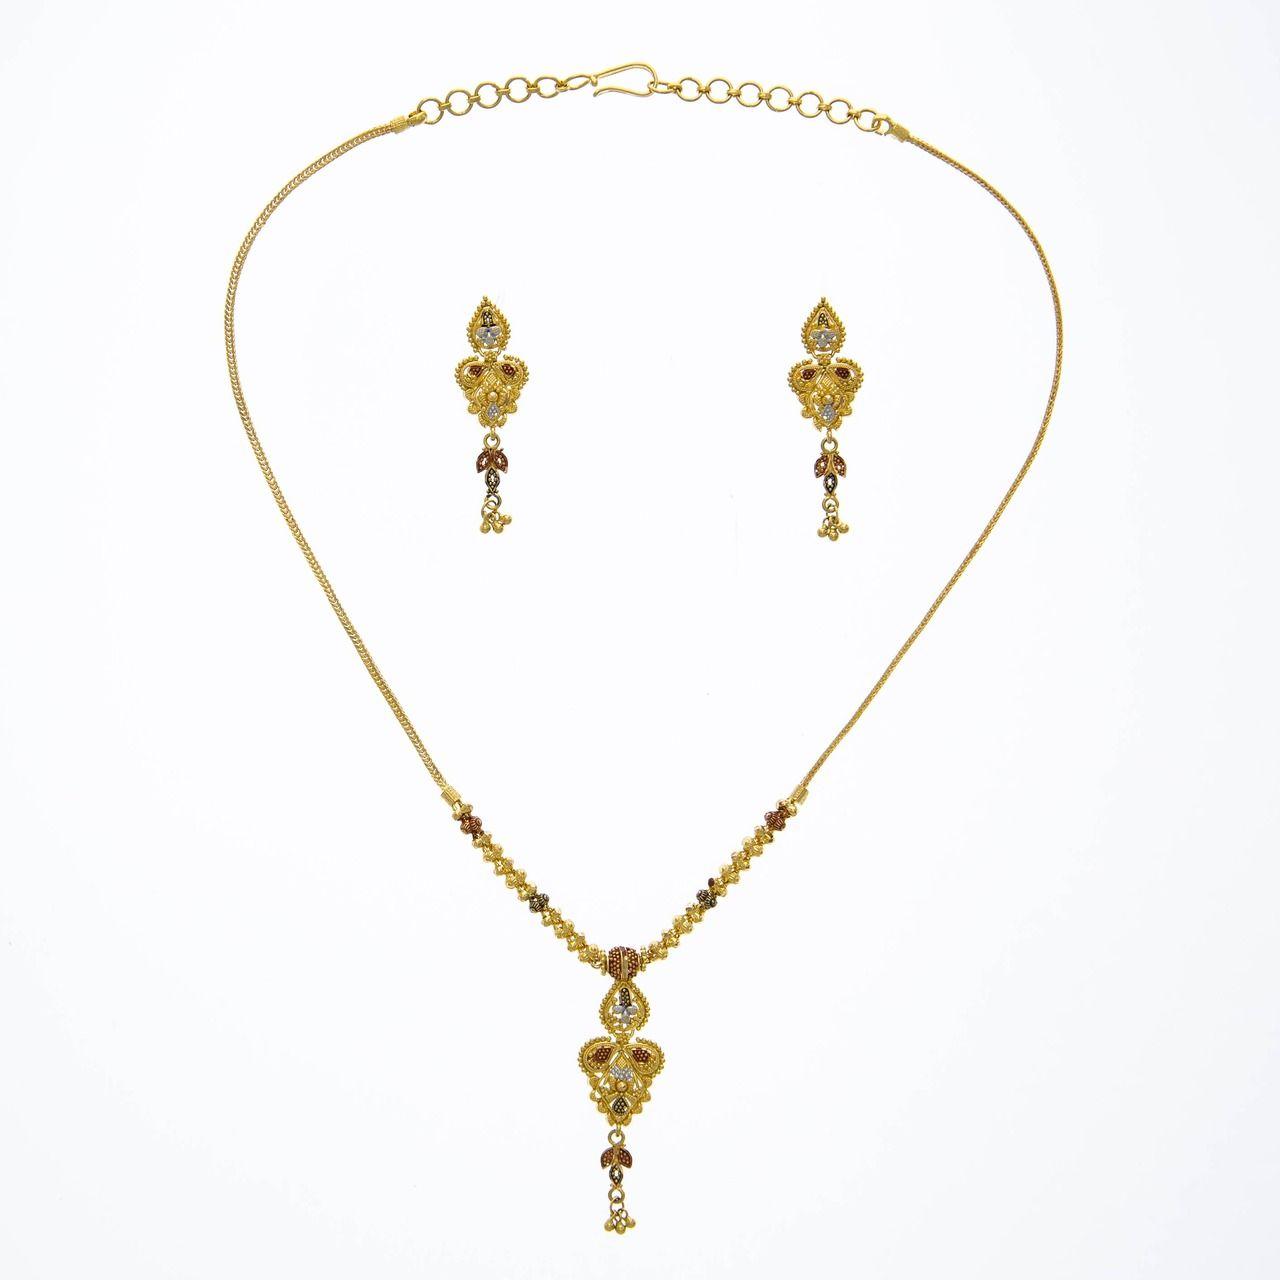 Kt gold filigree three piece set with three tone rhodium accents